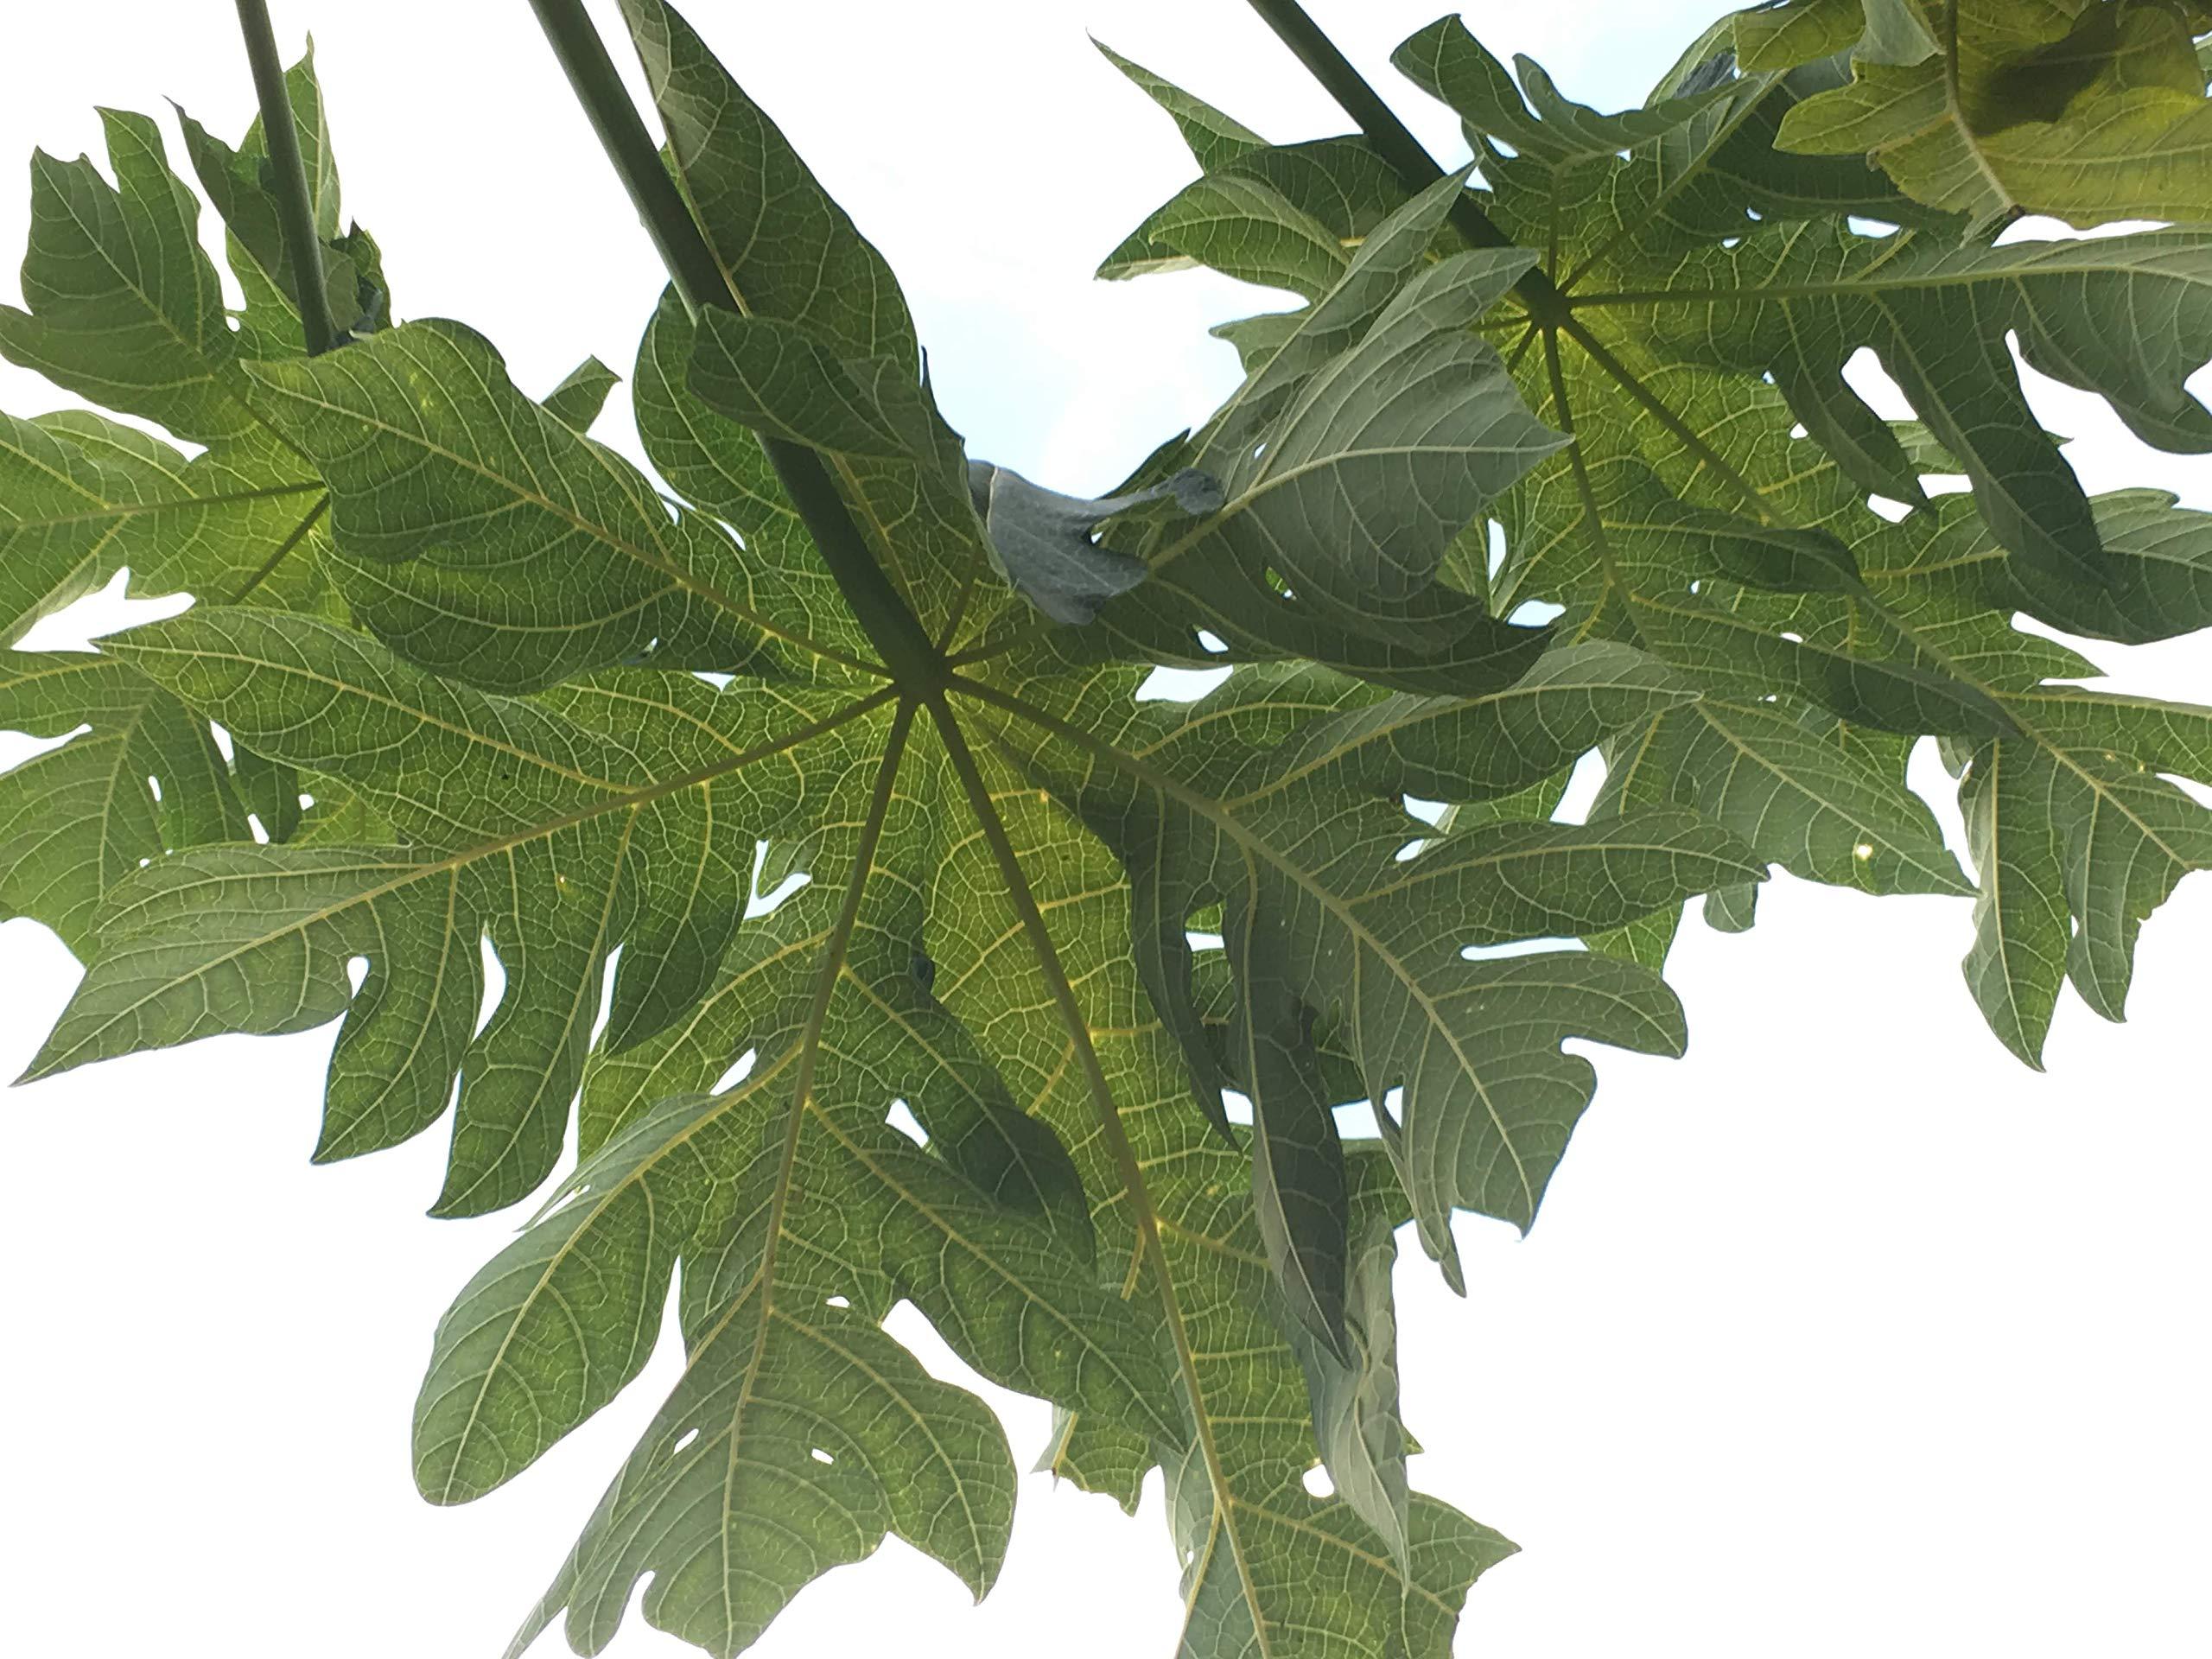 Papaya Leaves Fresh for Tea Organic All Natural, USA South Florida 15-16oz